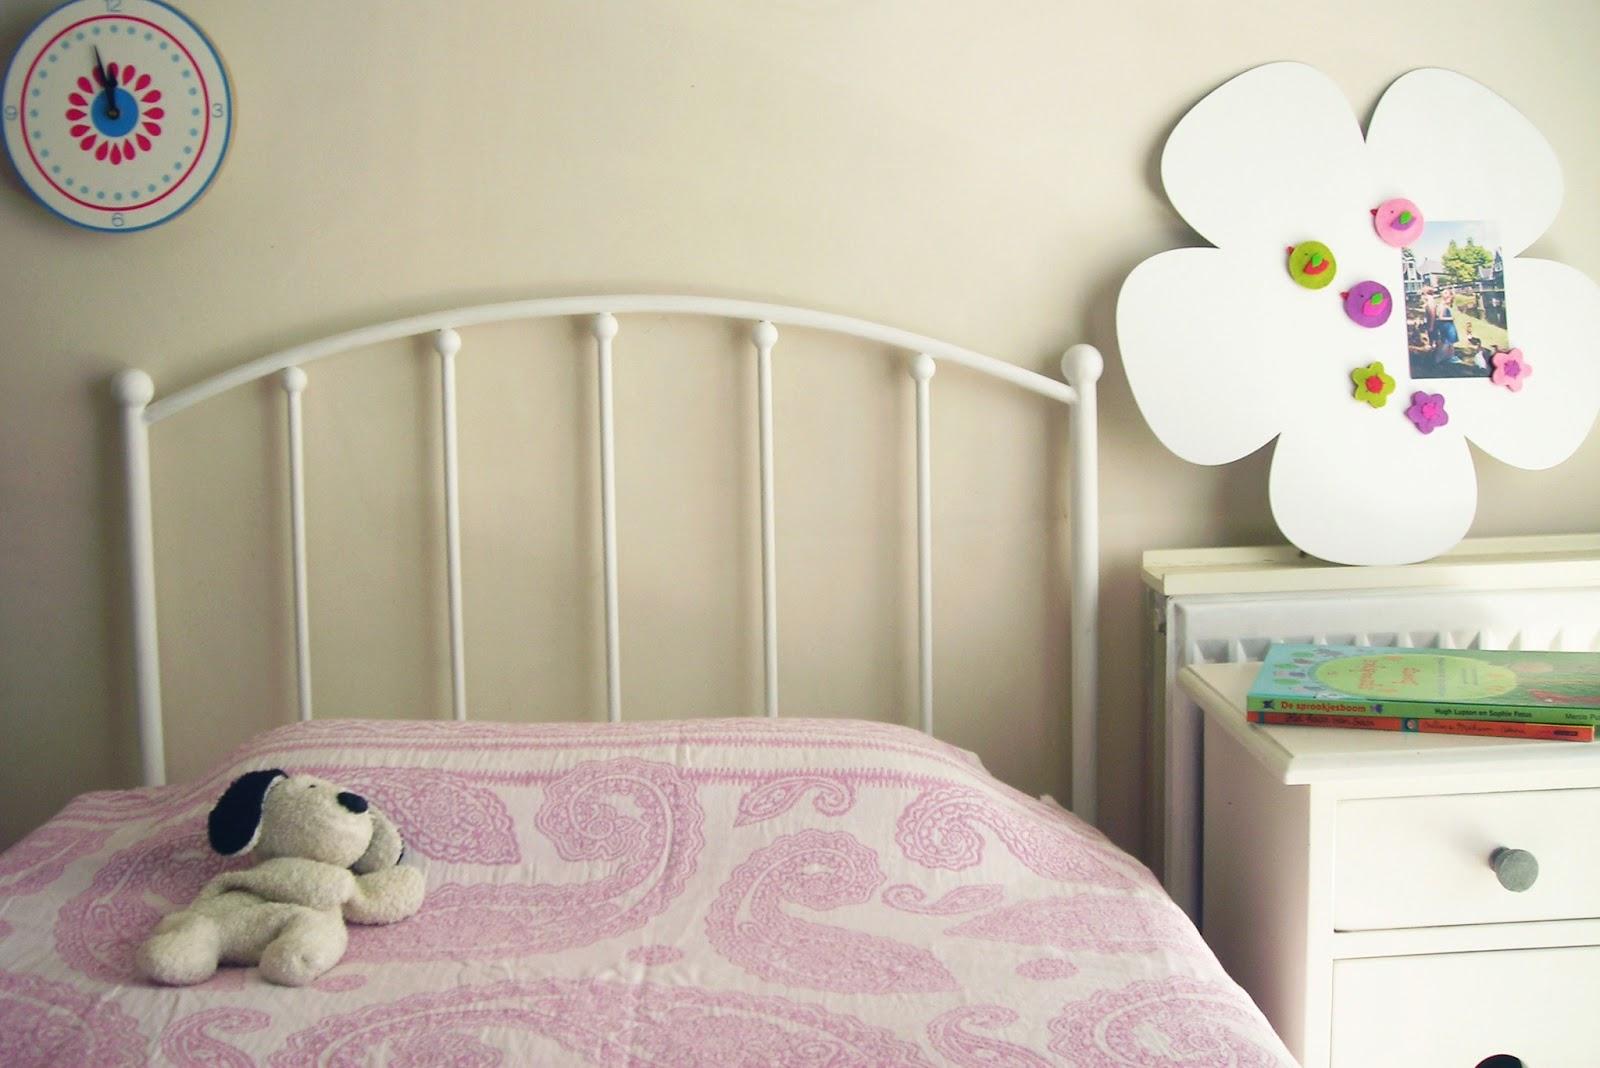 Kalma violeta camas y cabeceros para ni os - Camas infantiles blancas ...